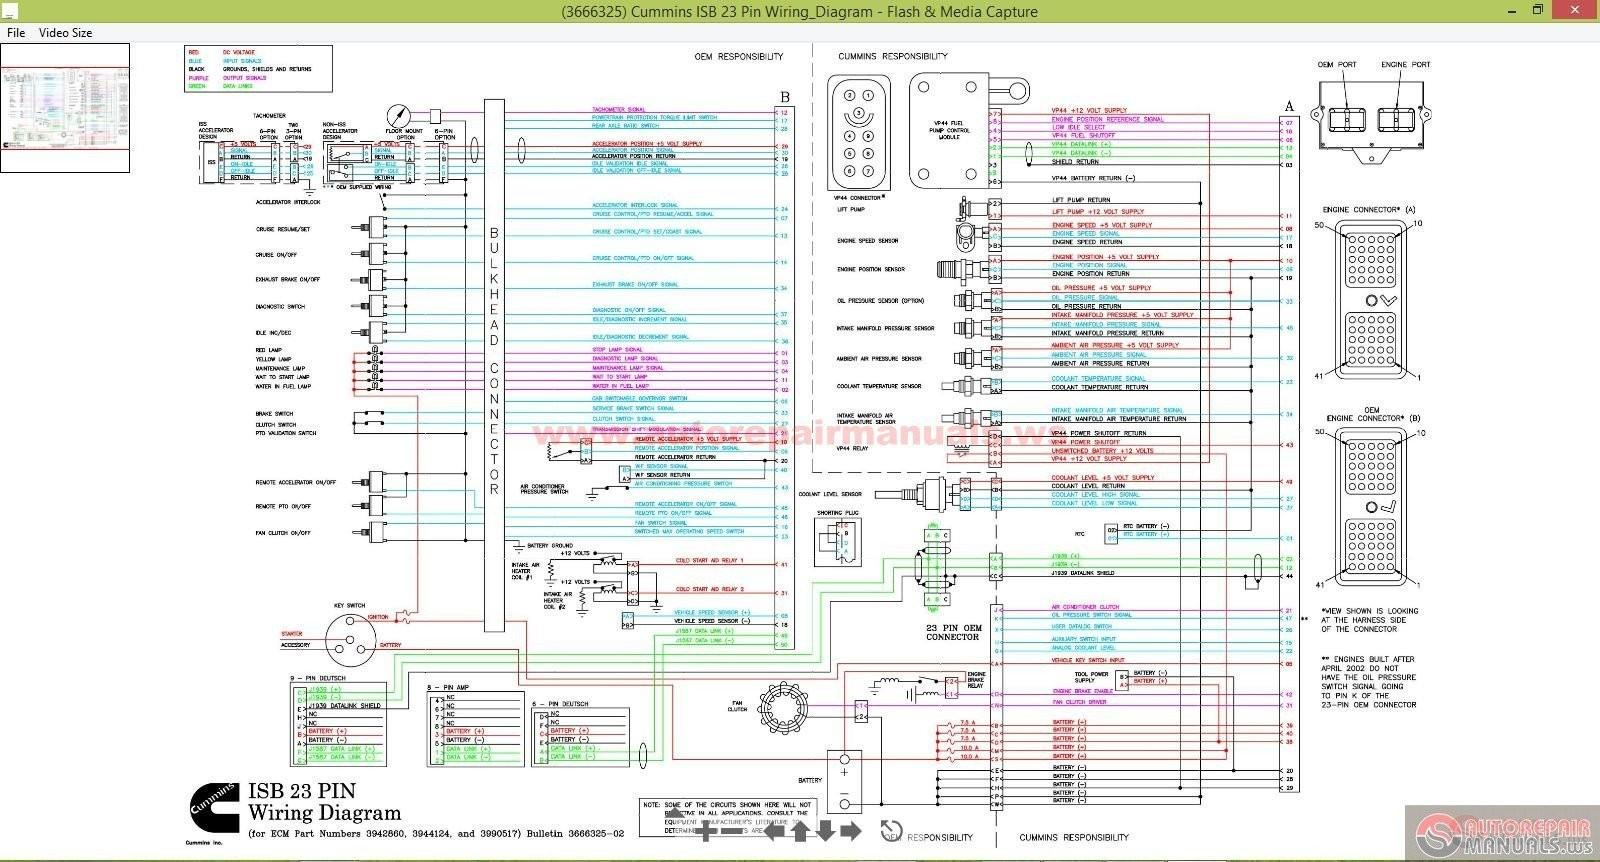 Cummins Engine Ecm Wiring Diagrams